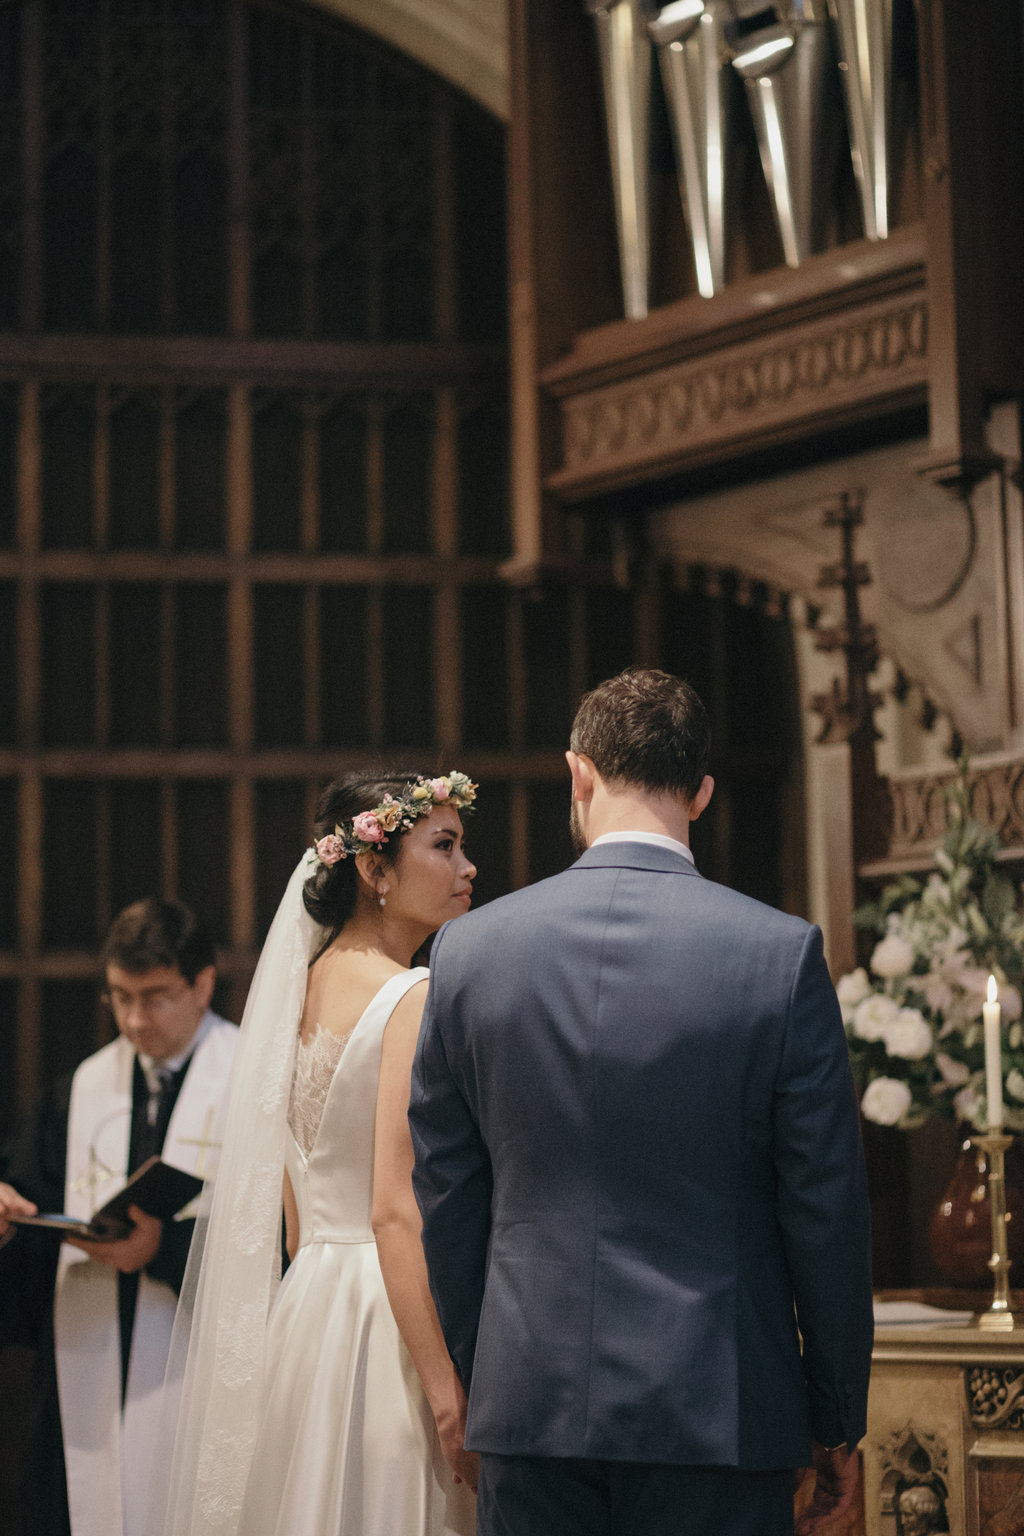 sebastienboudot-wedding-photographer-nadia-eric-254